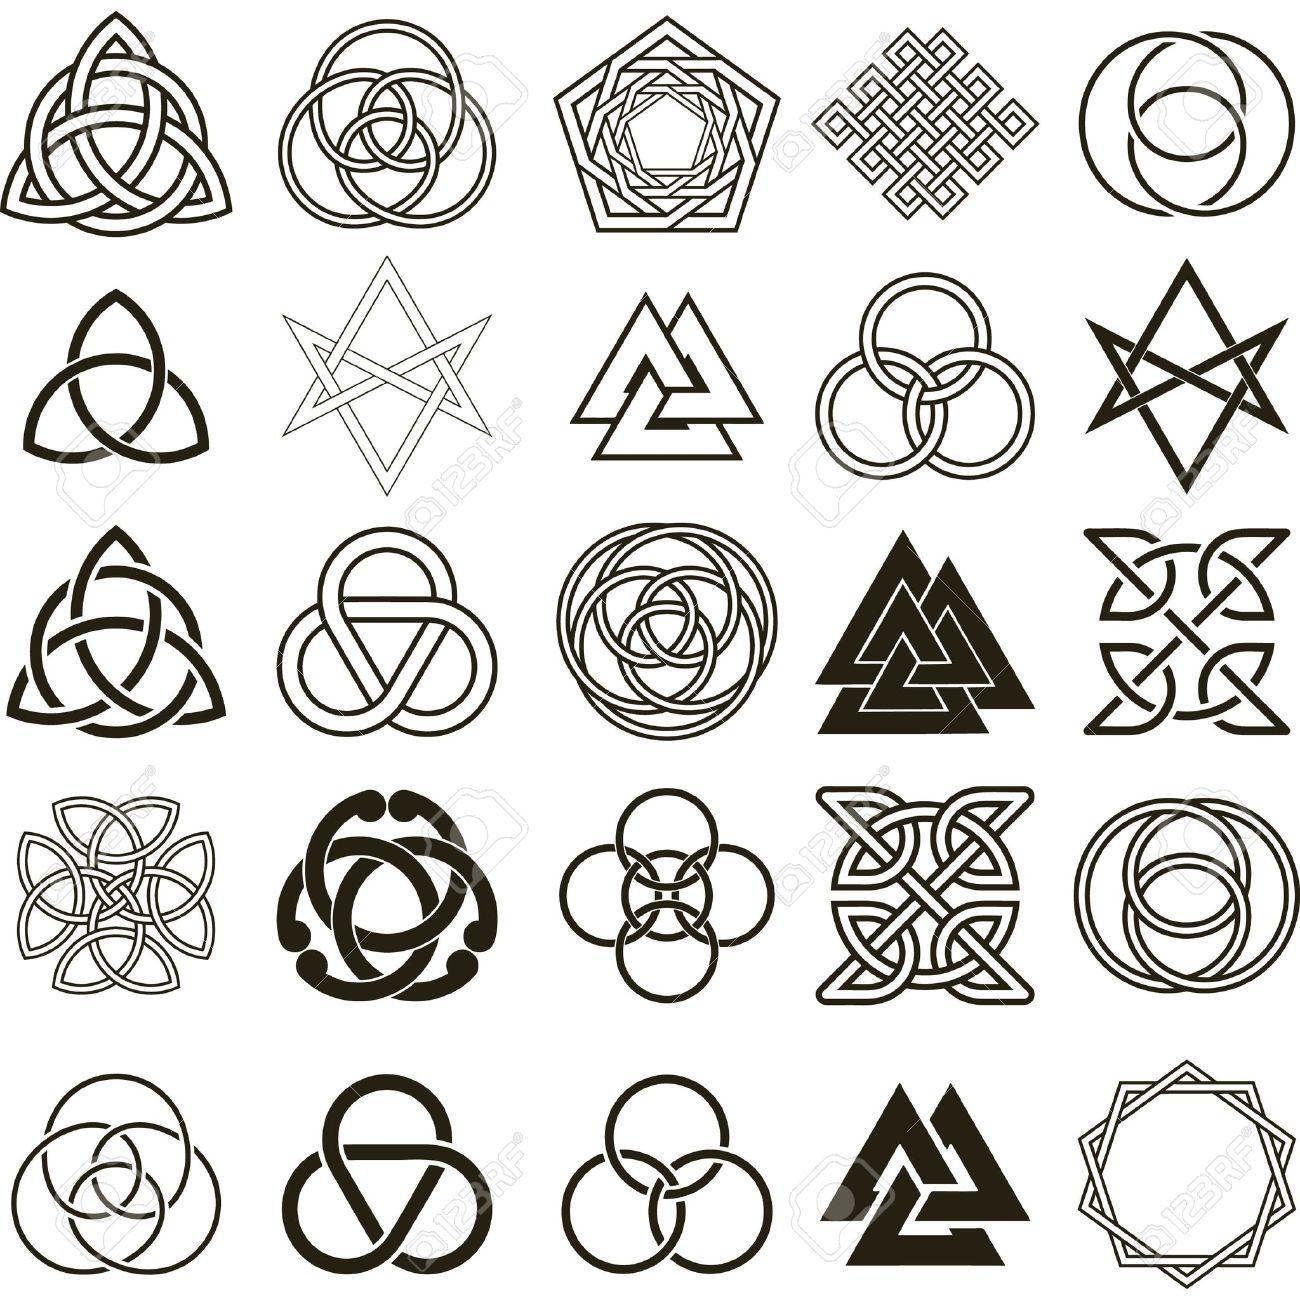 Celtic art symbols and meanings celtic symbols icons item 1 celtic art symbols and meanings celtic symbols icons item 1 vector magz free download vector norweigensceltic ect pinterest celtic art biocorpaavc